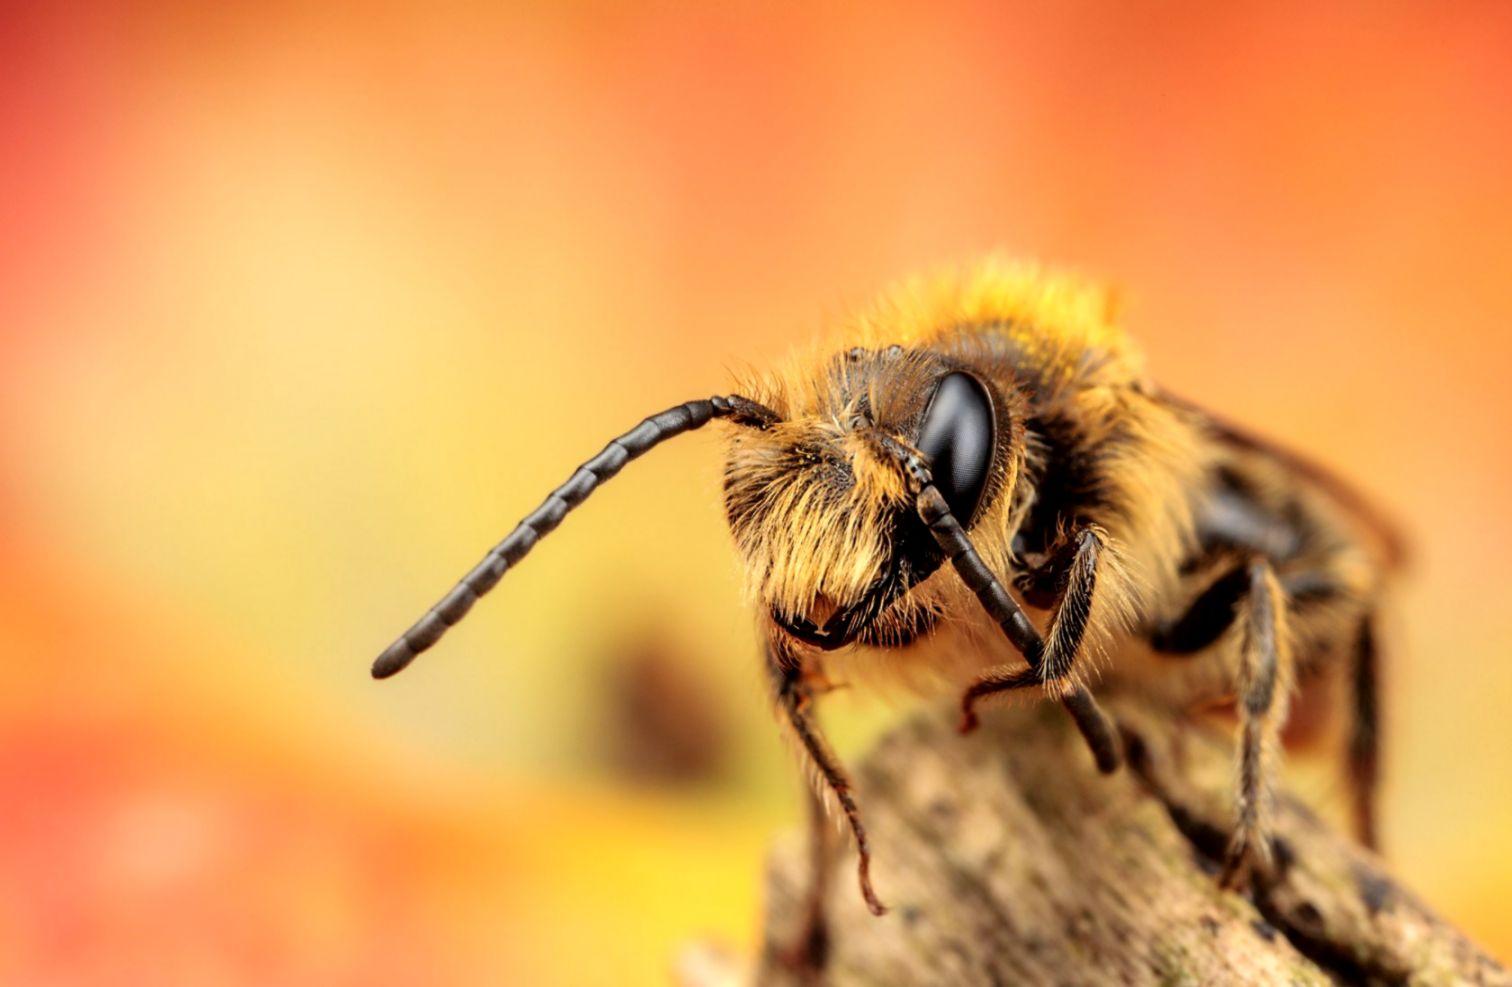 Photography Macro Honey Bee Hd Wallpaper Link Wallpapers